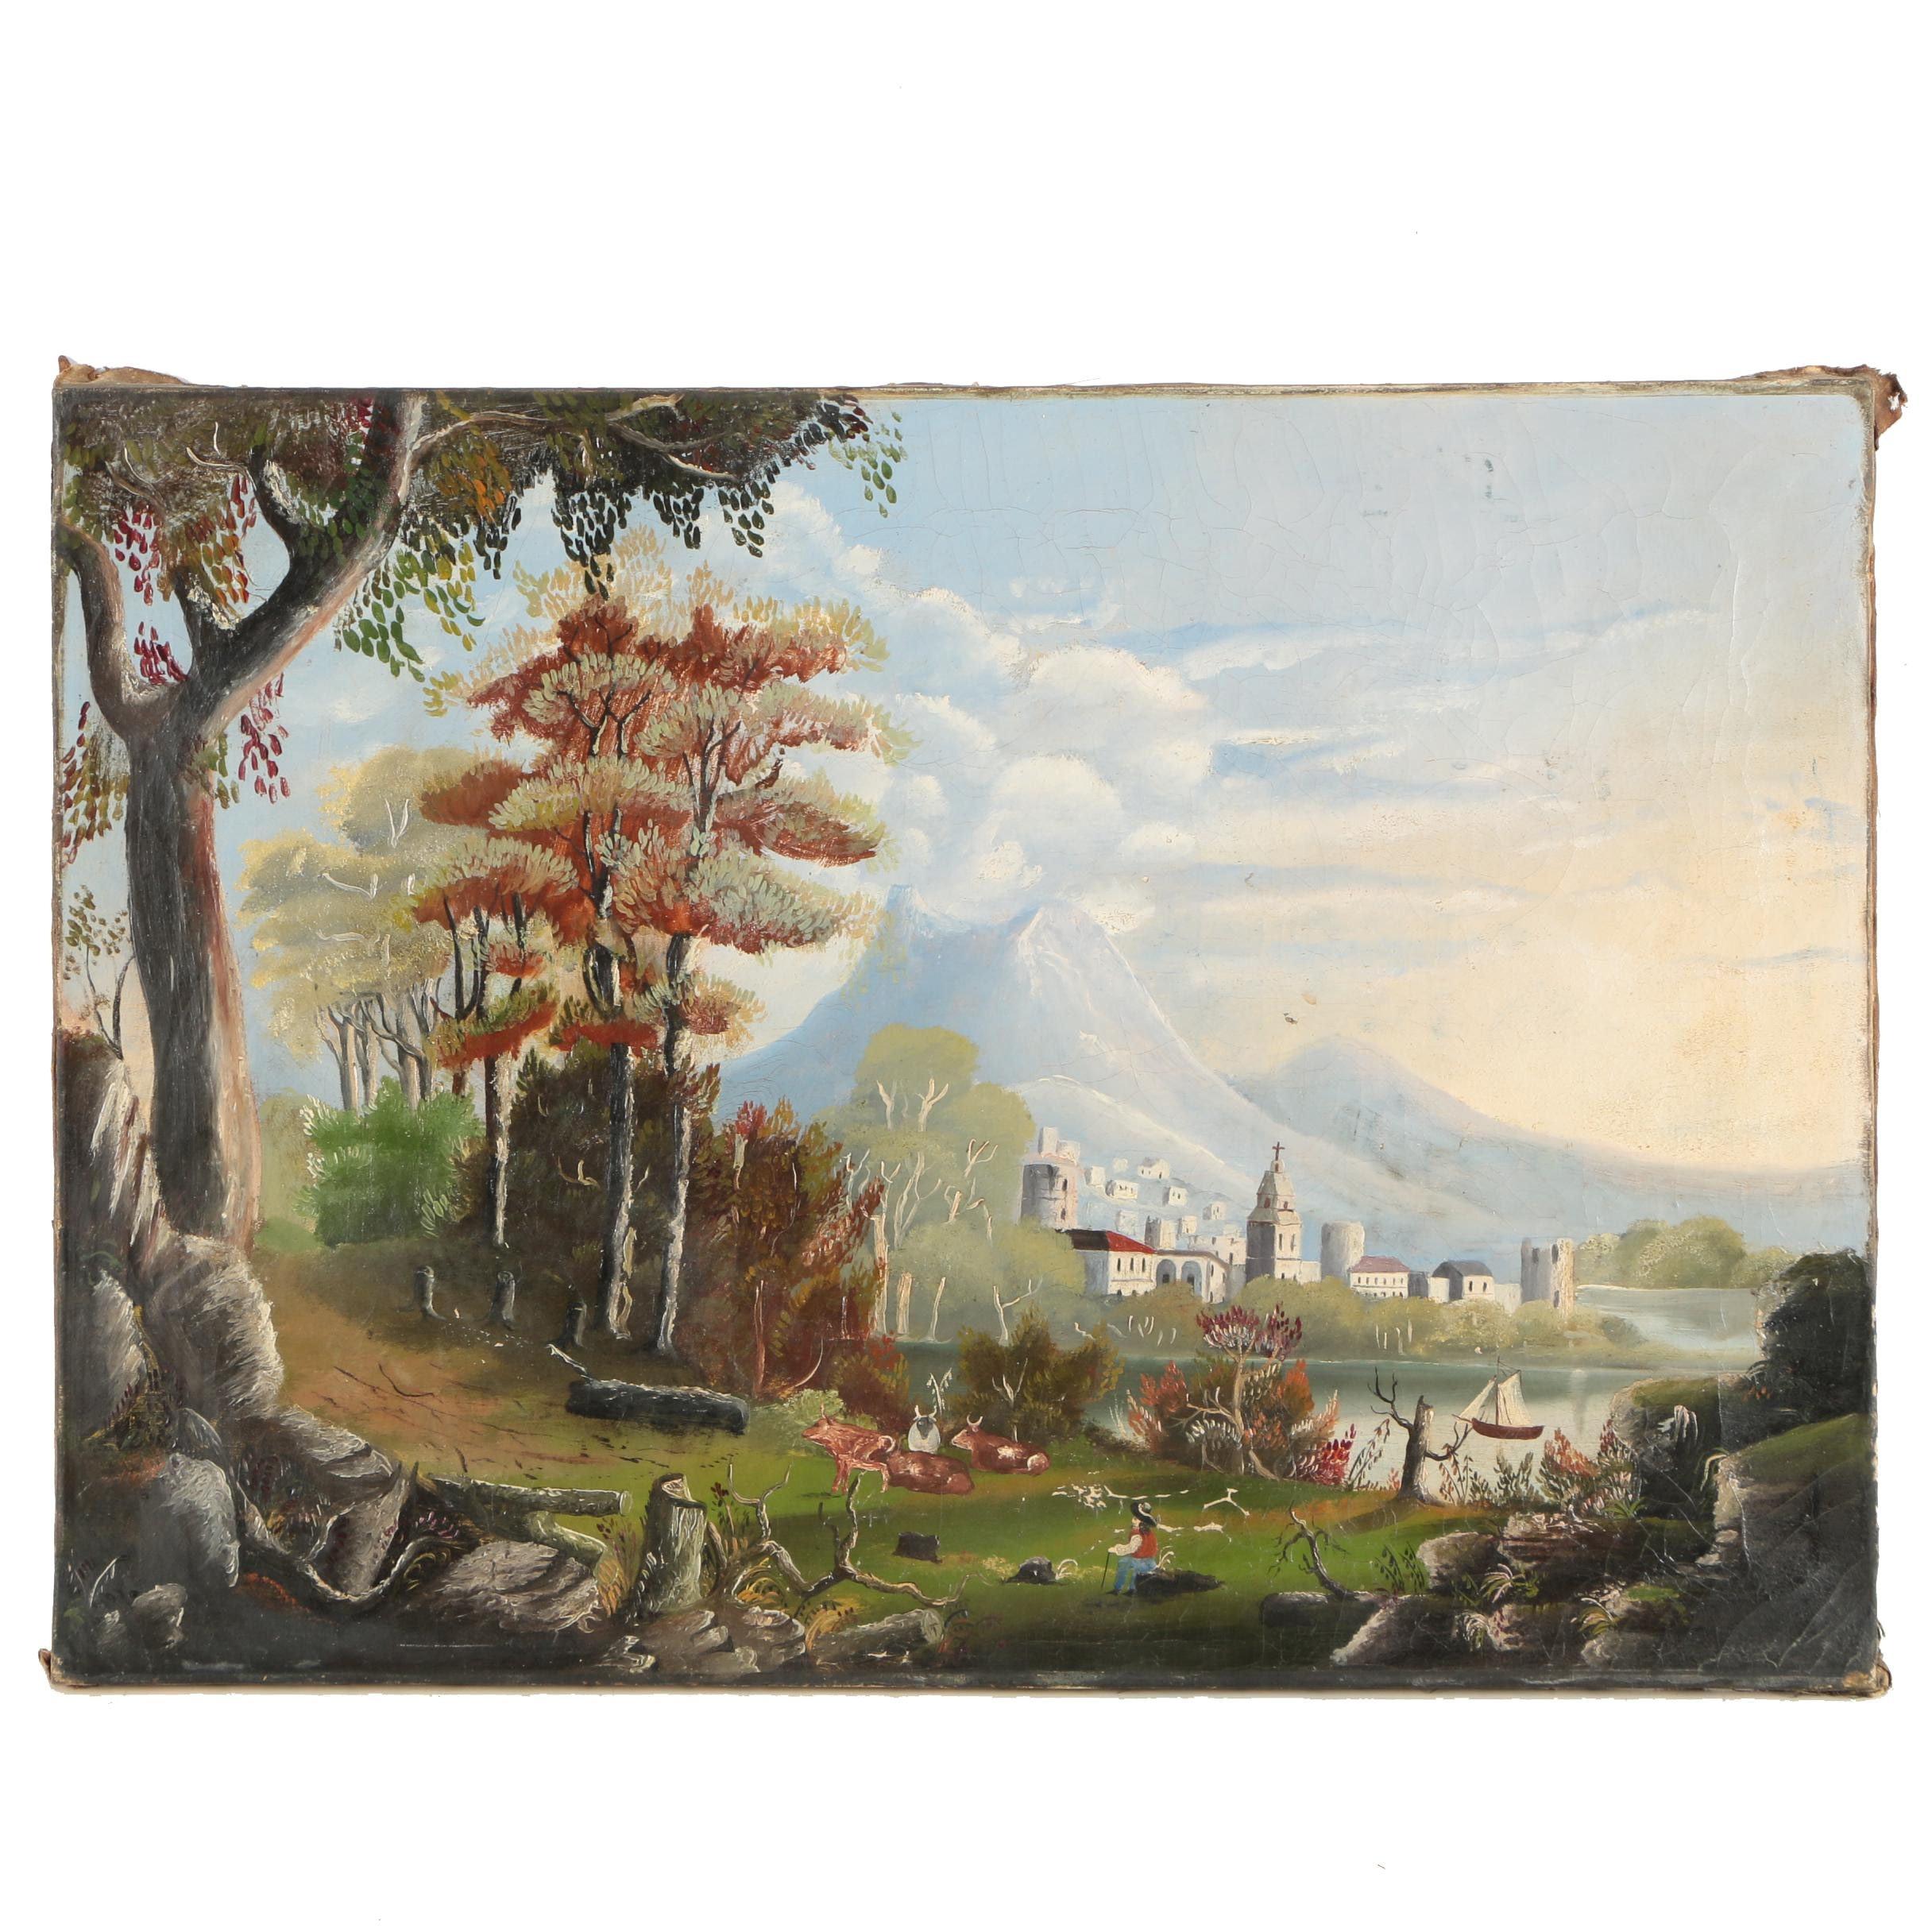 Antique Oil on Canvas Painting of a European Landscape